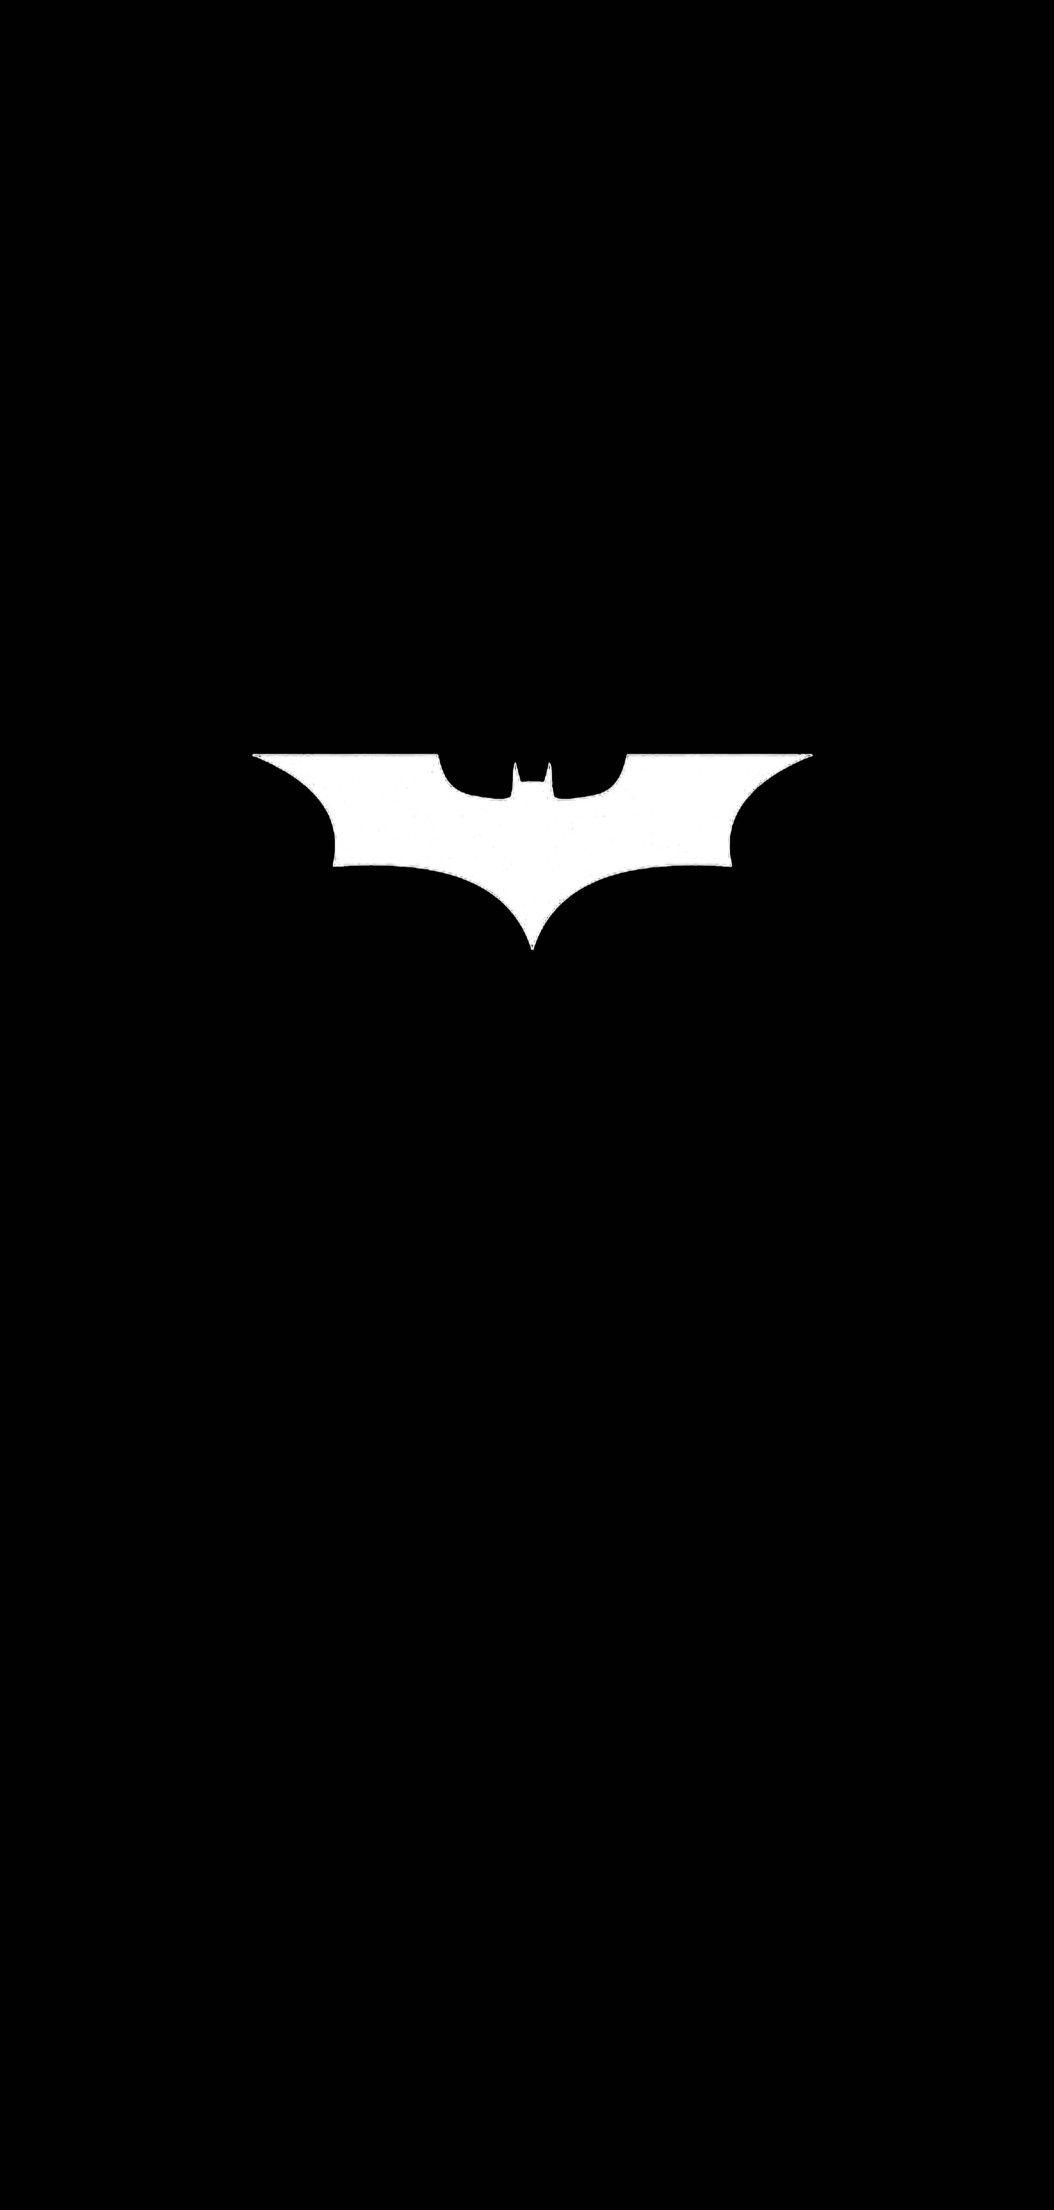 Batman Logo Black And White Dark Wallpaper Iphone City Wallpaper Dark Wallpaper